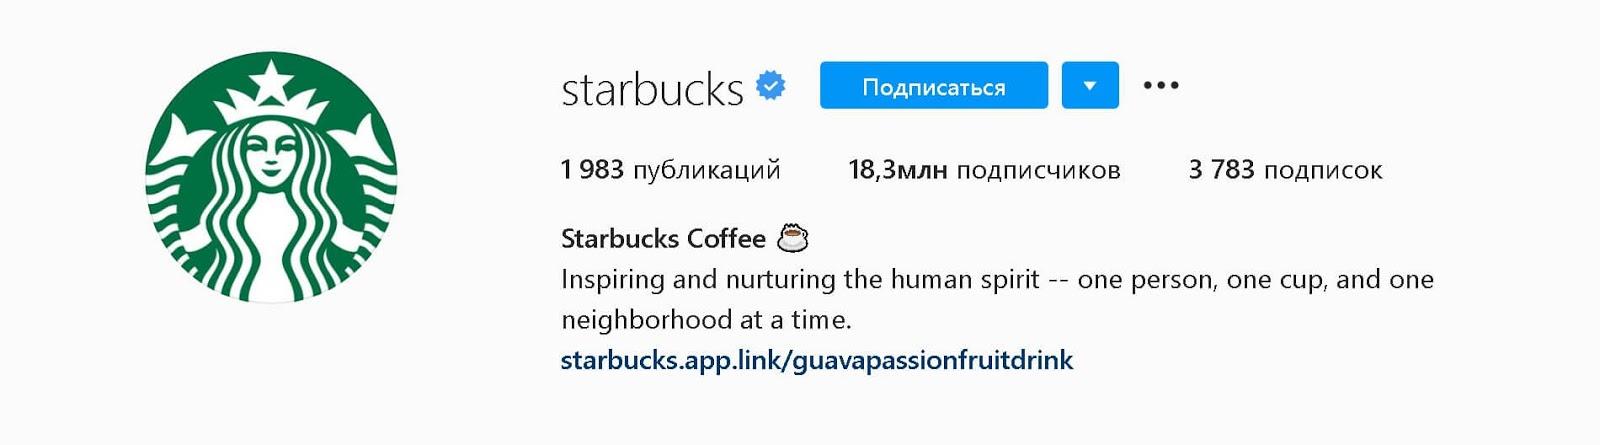 instagram-bios-starbucks